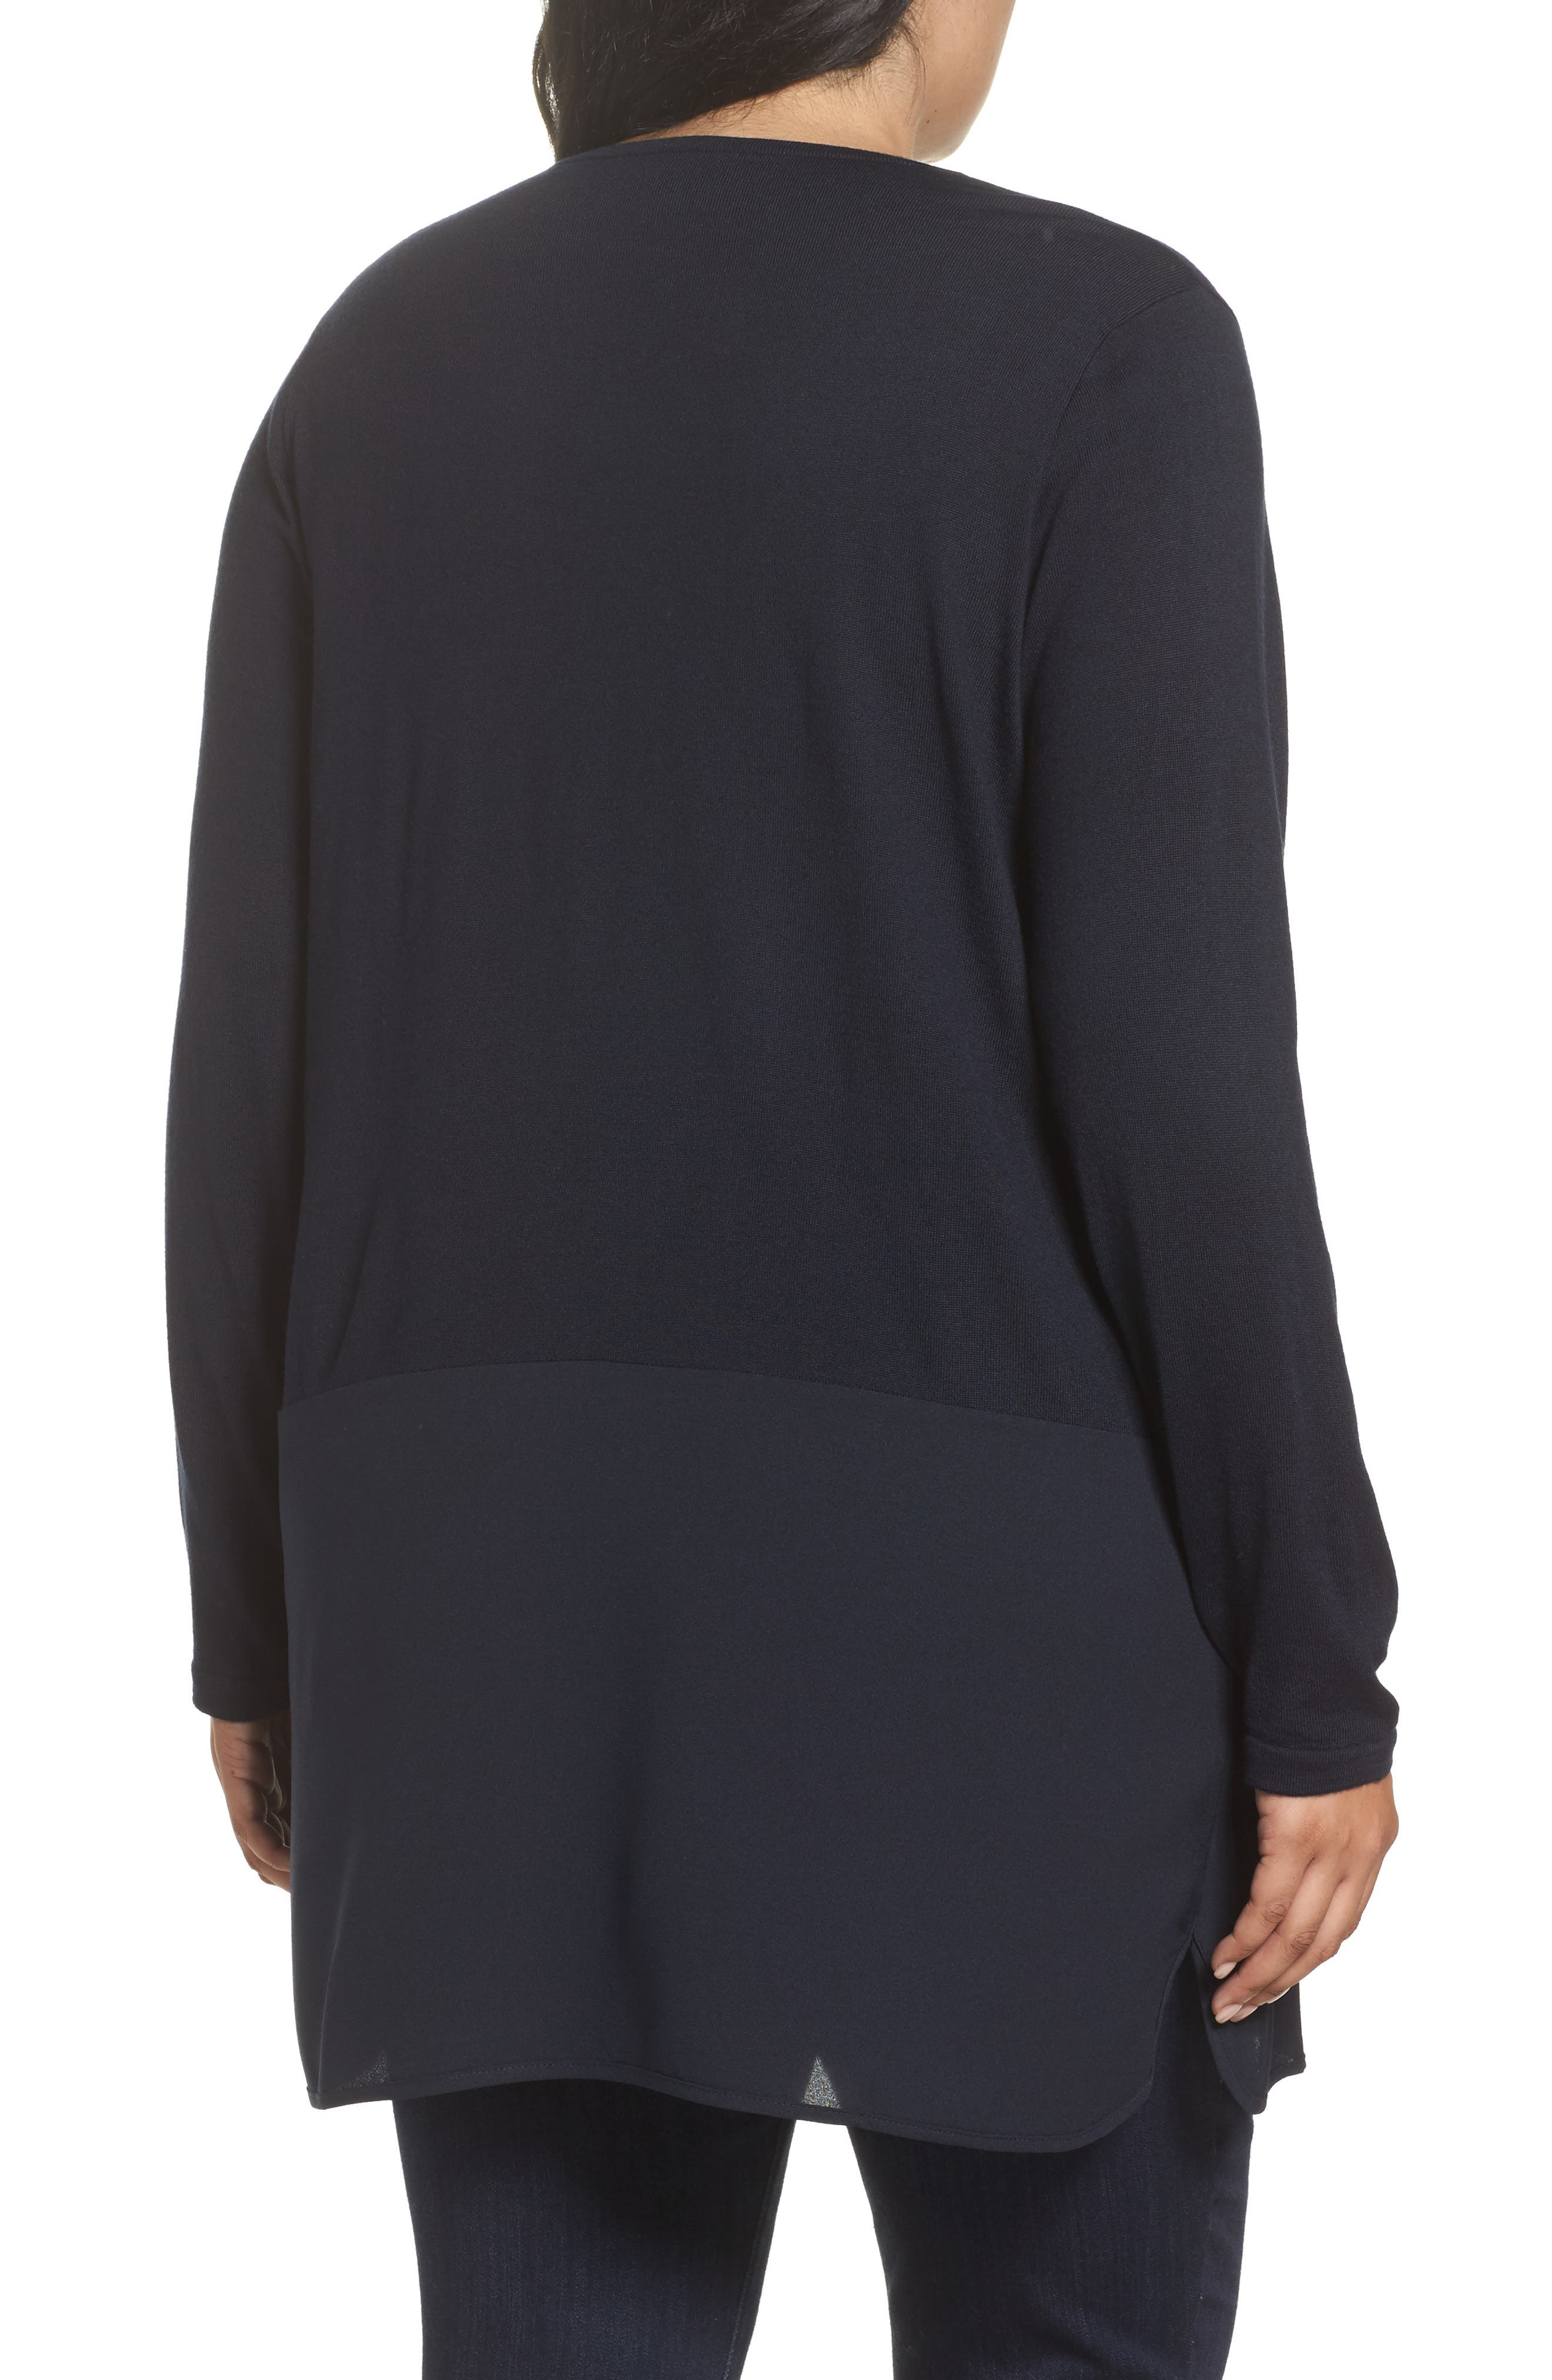 Alternate Image 2  - Persona by Marina Rinaldi Adamo MIxed Media Sweater (Plus Size)